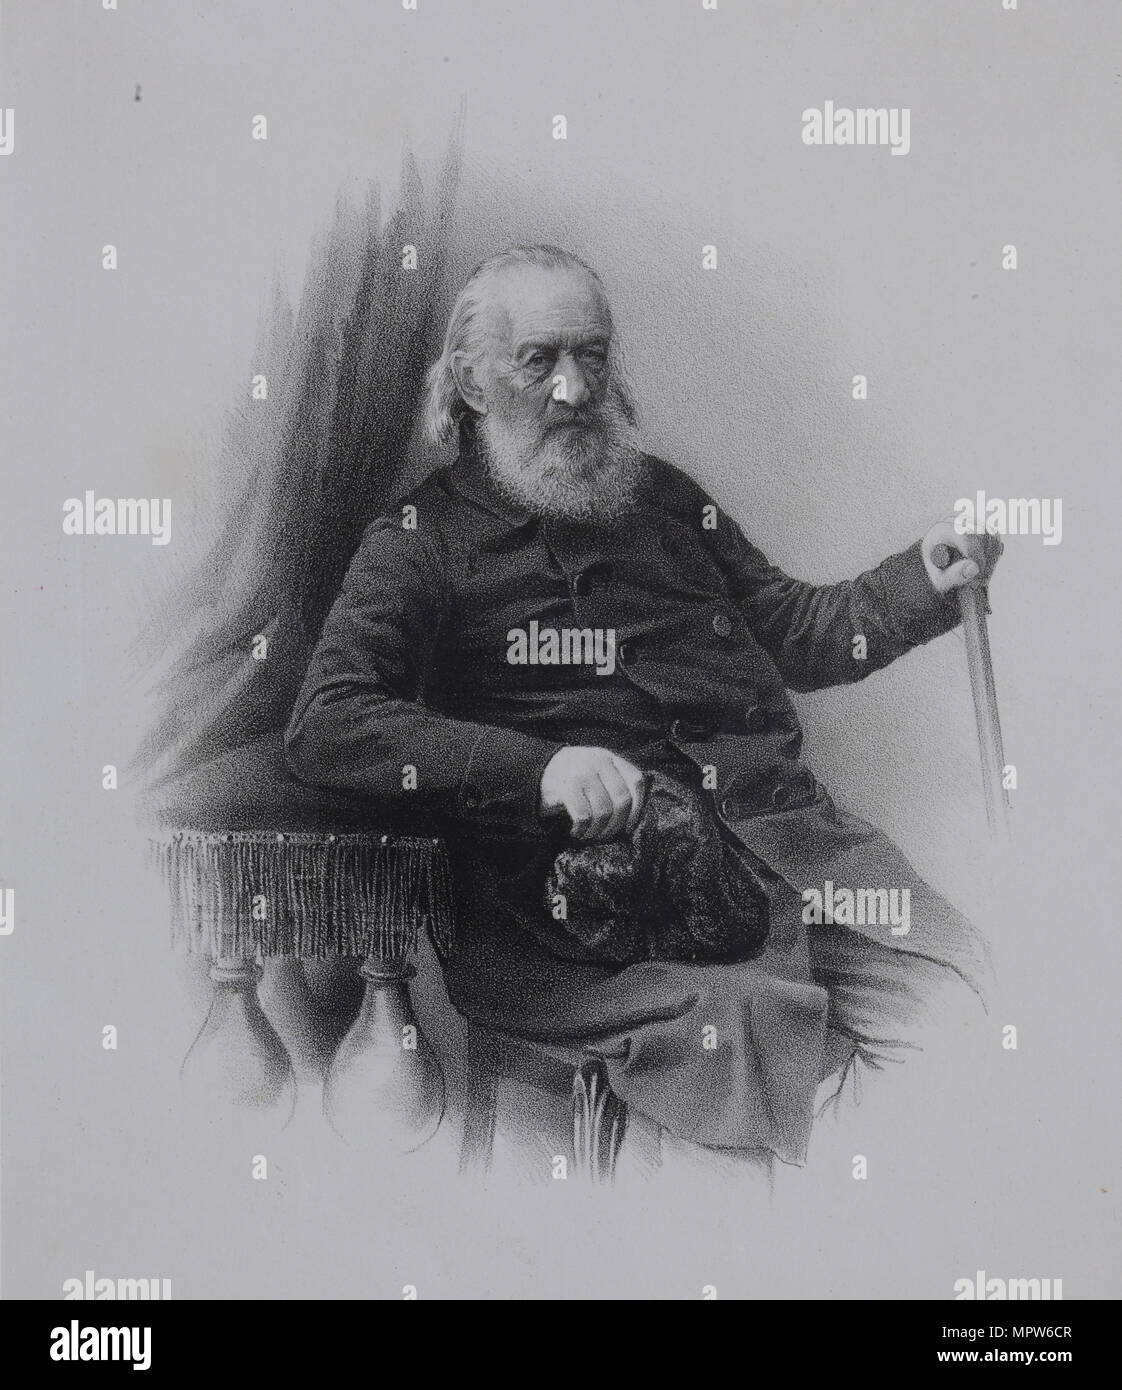 Portrait of the Decembrist count Sergey Volkonsky (1788-1865), 1860s. - Stock Image